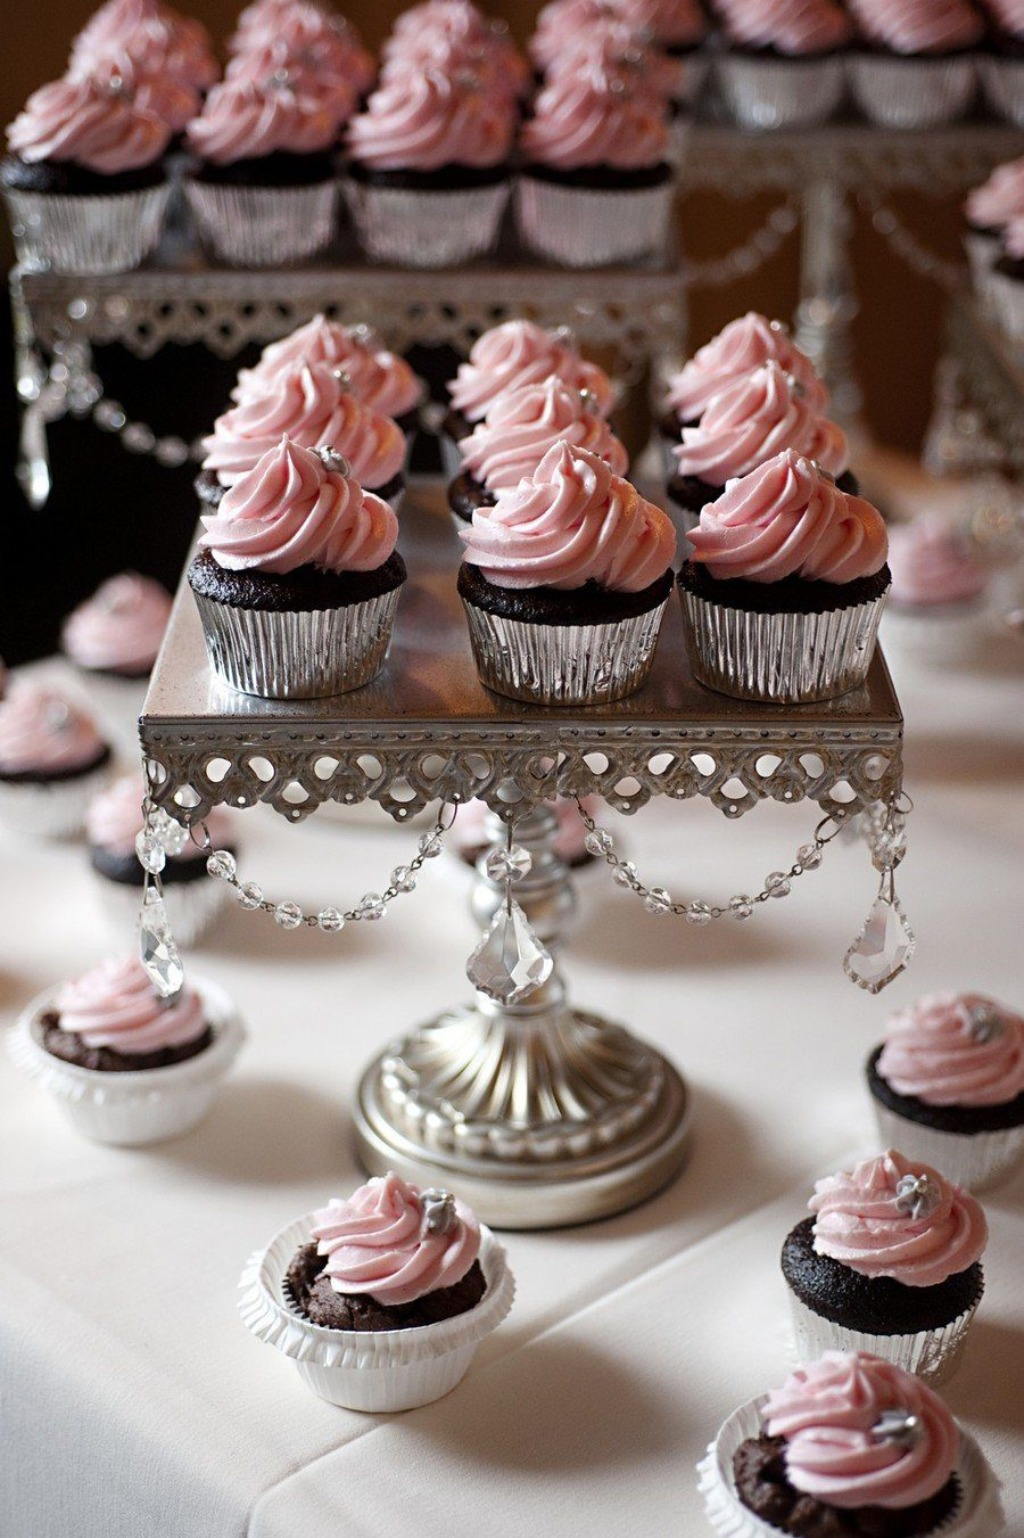 811242_chandelier-dessert-stands-created-by-opu.jpg